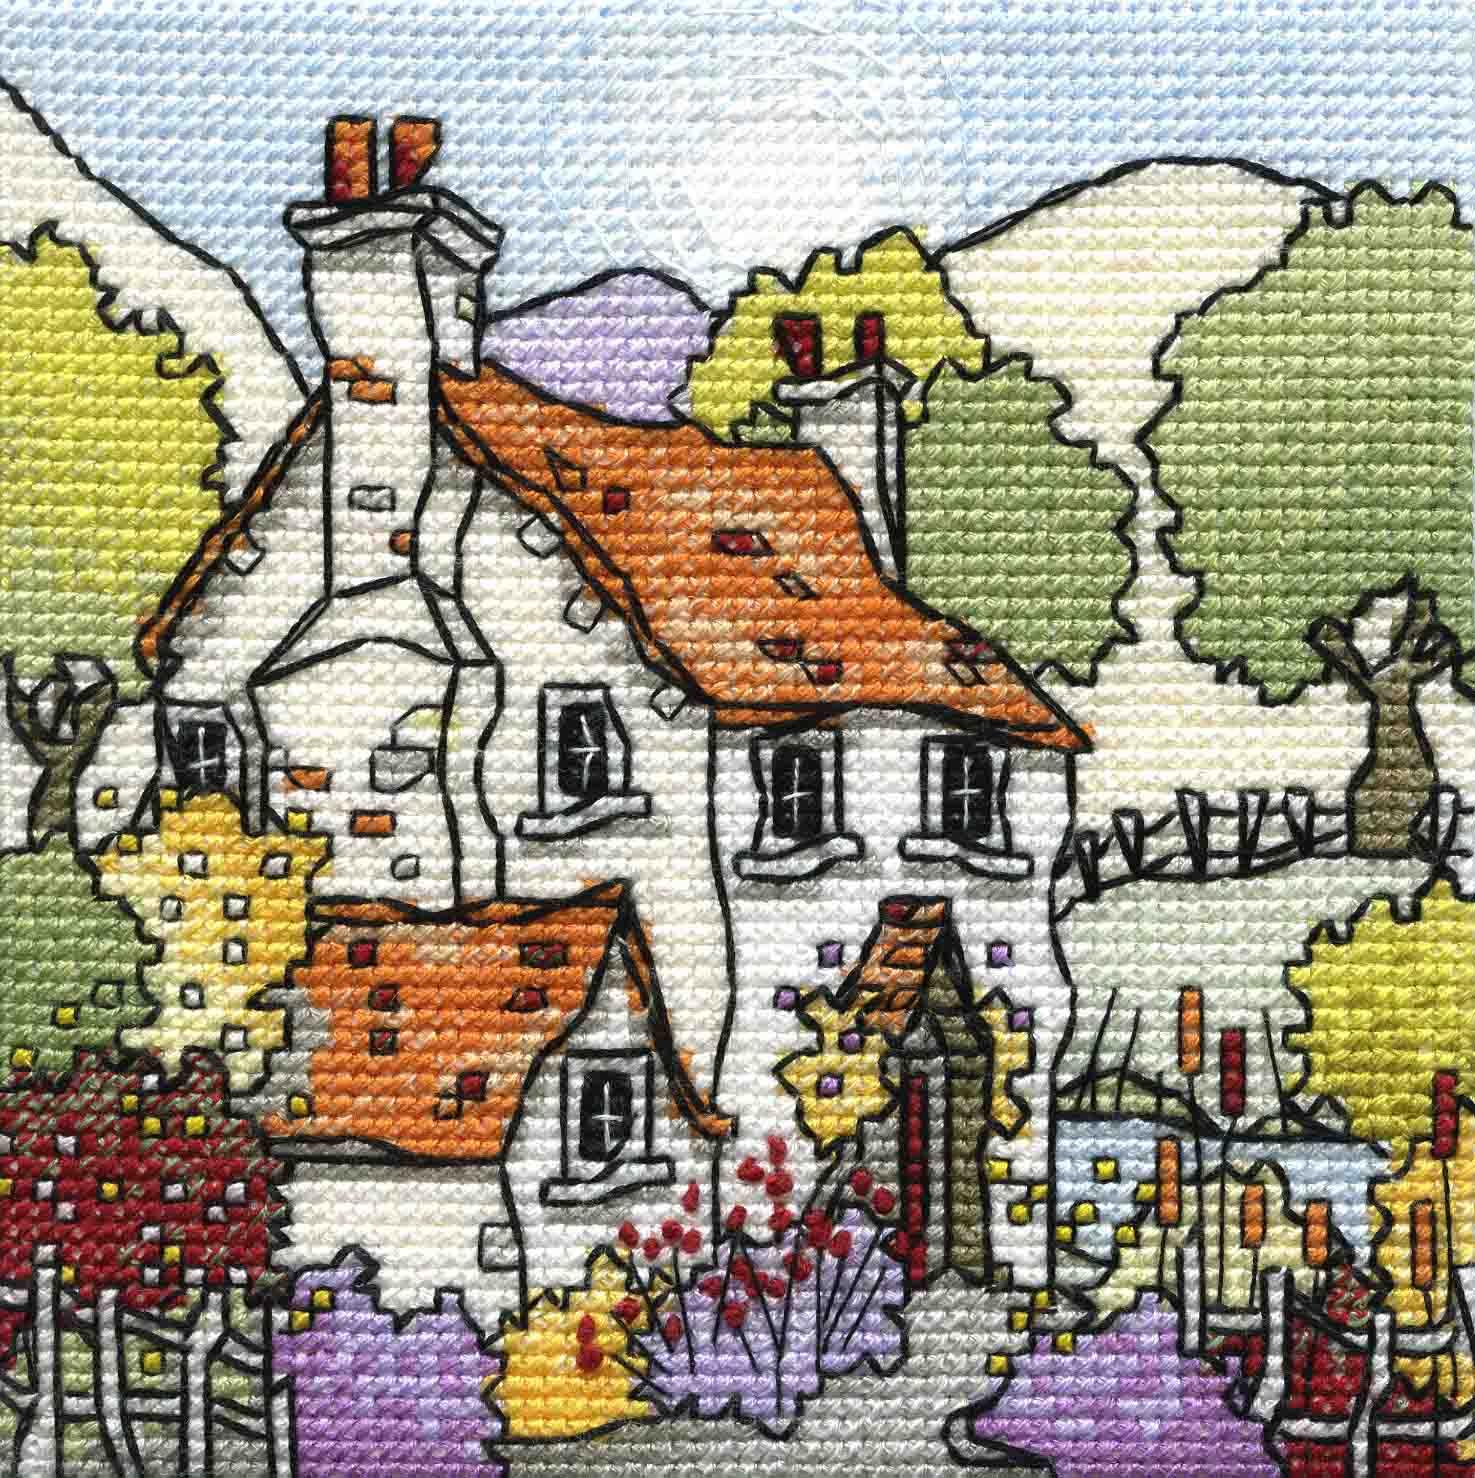 Mini River Cottage stitched